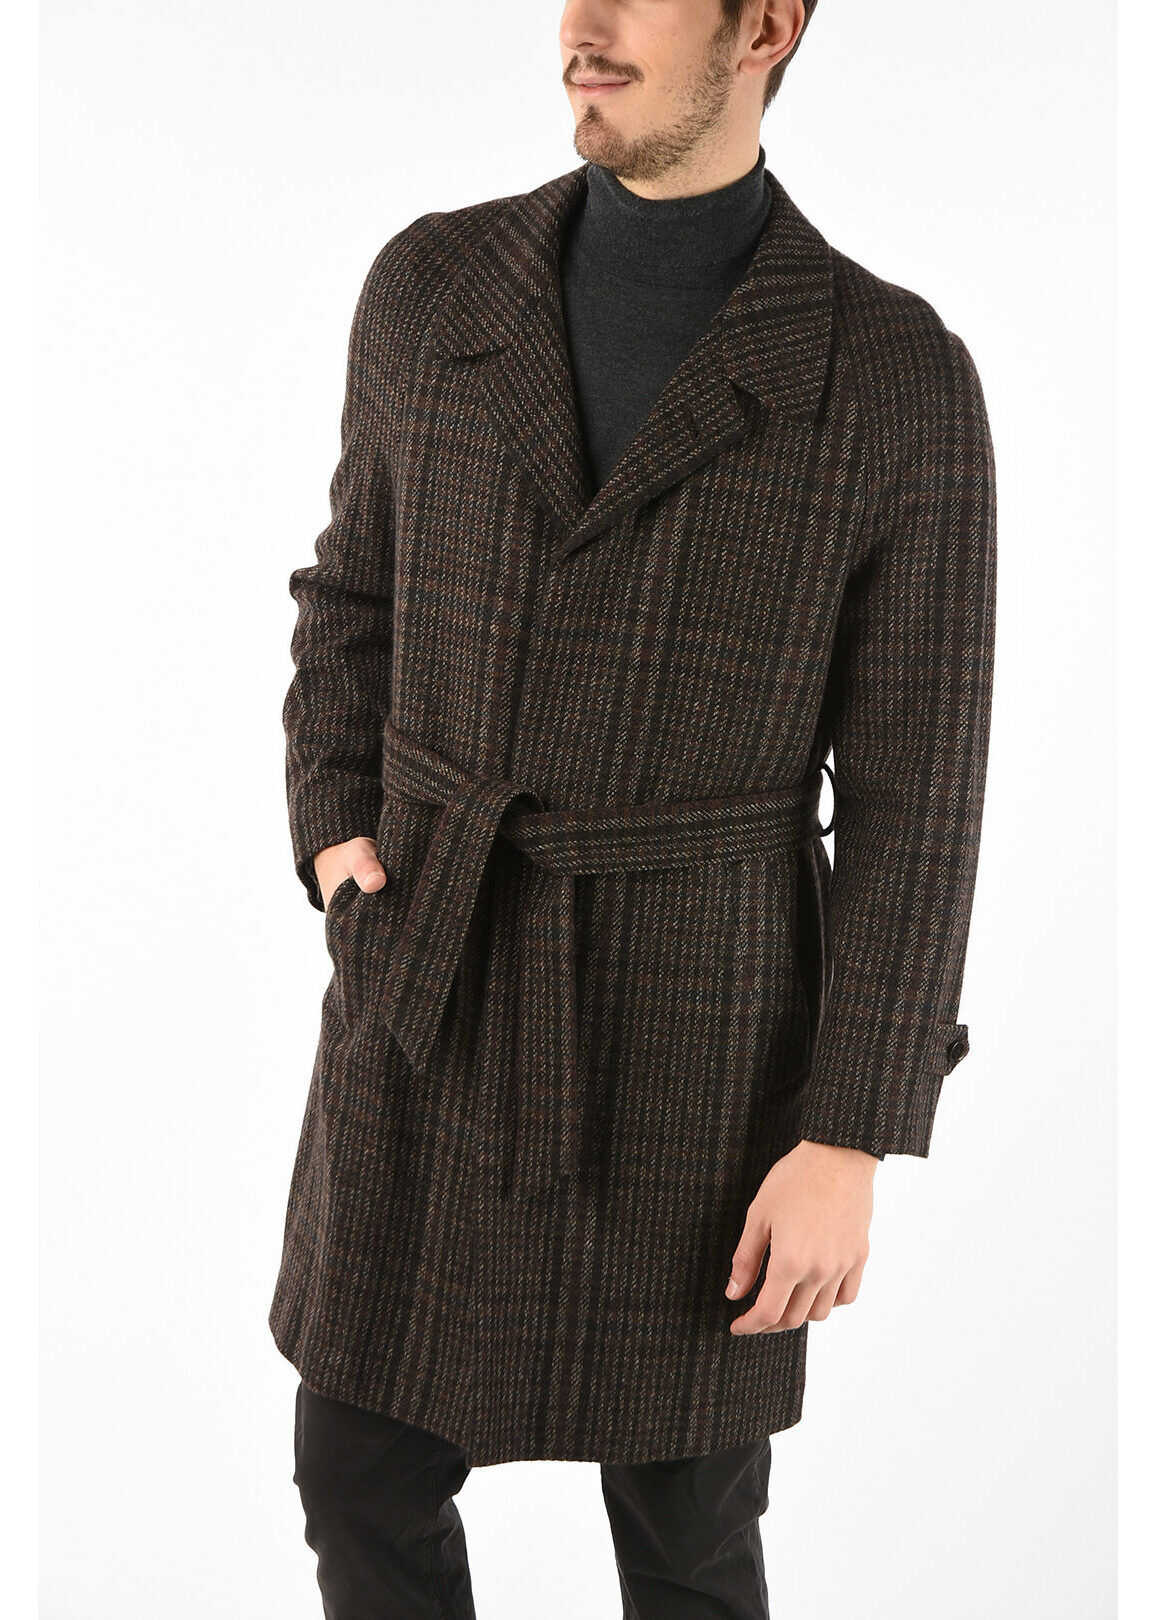 CORNELIANI cashmere PIUMA chesterfield coat with Belt BROWN imagine